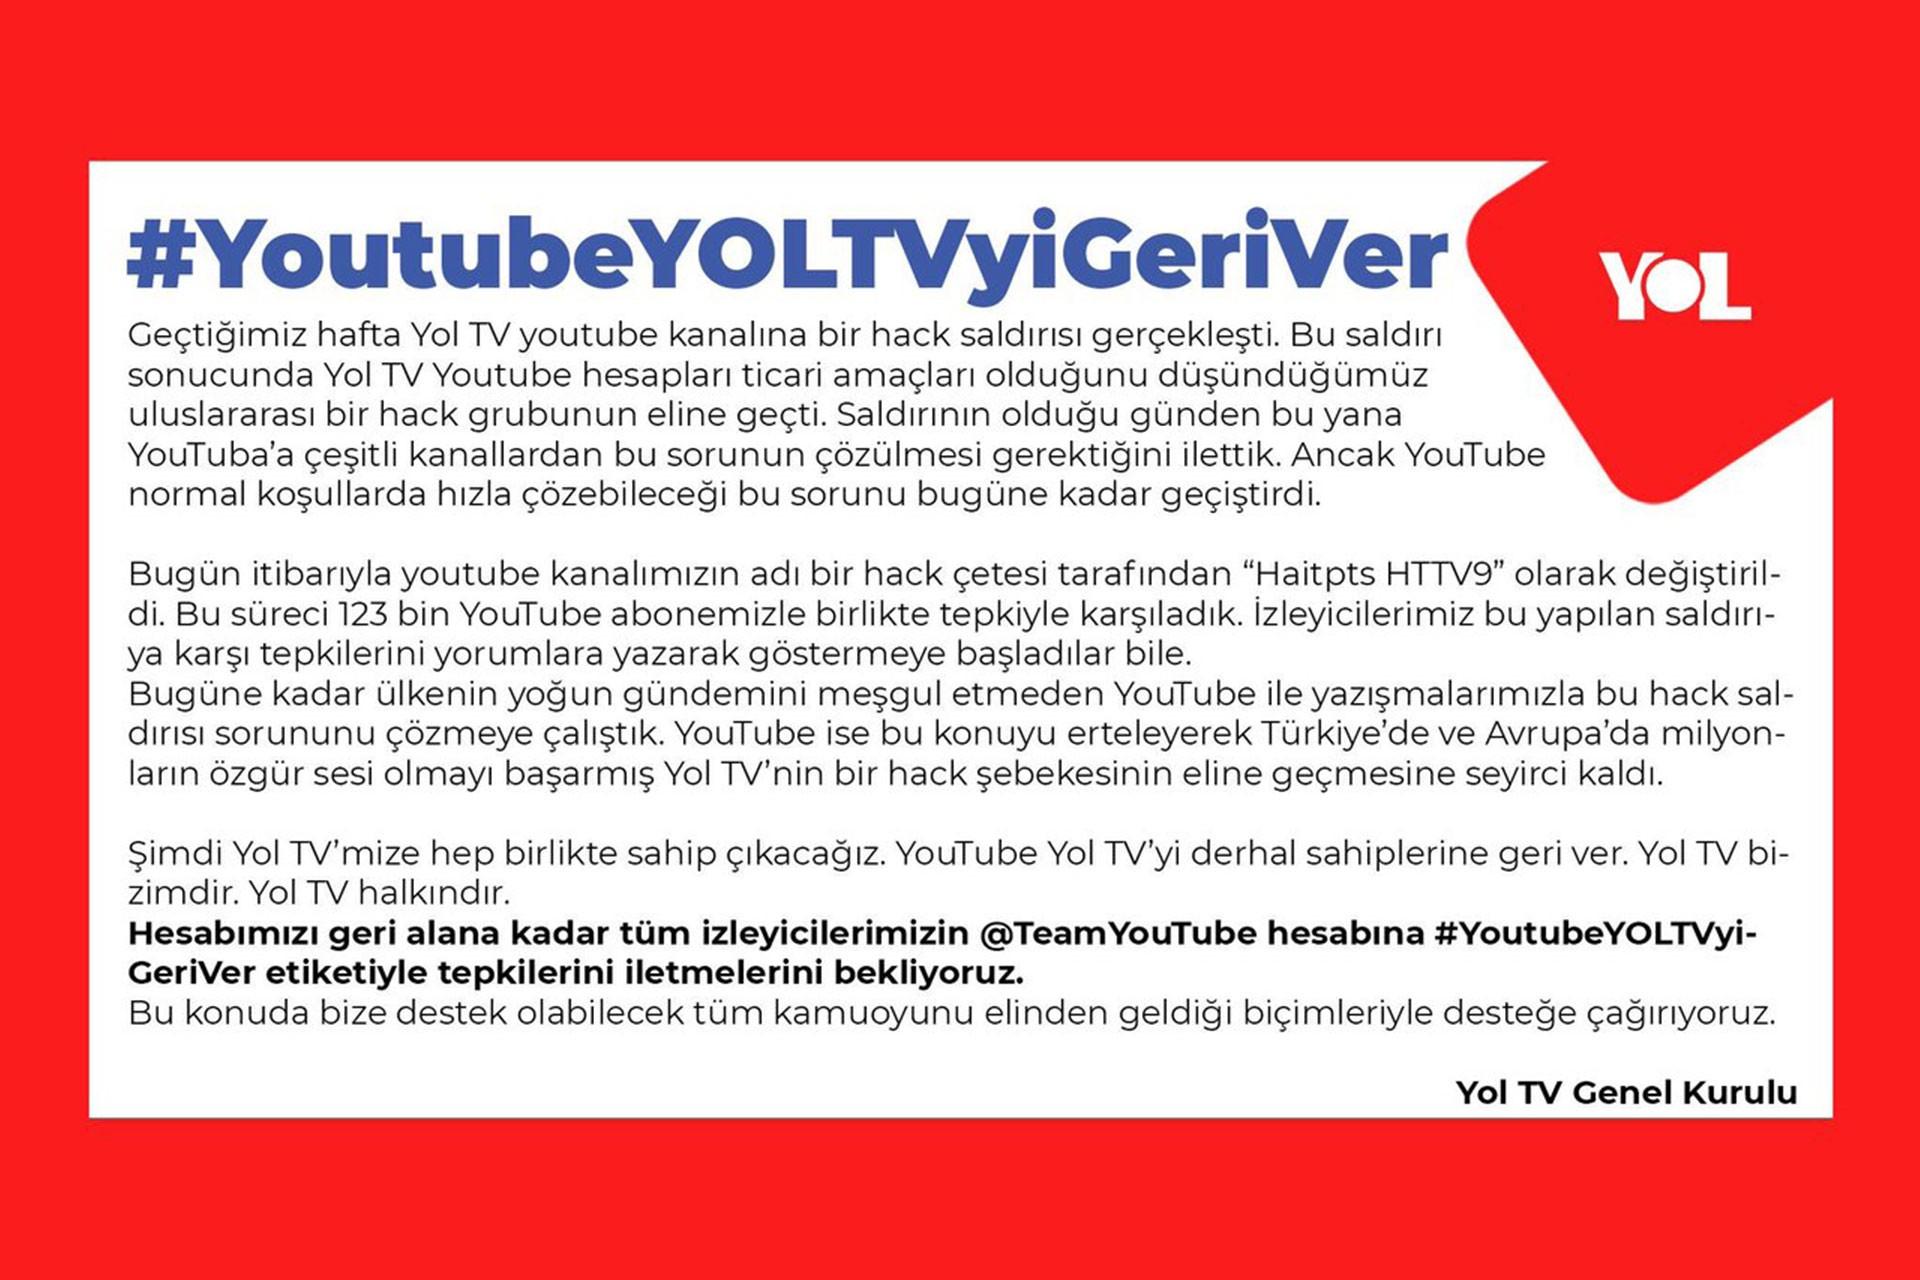 Sosyal medyada #YoutubeYOLTVyiGeriVer kampanyası